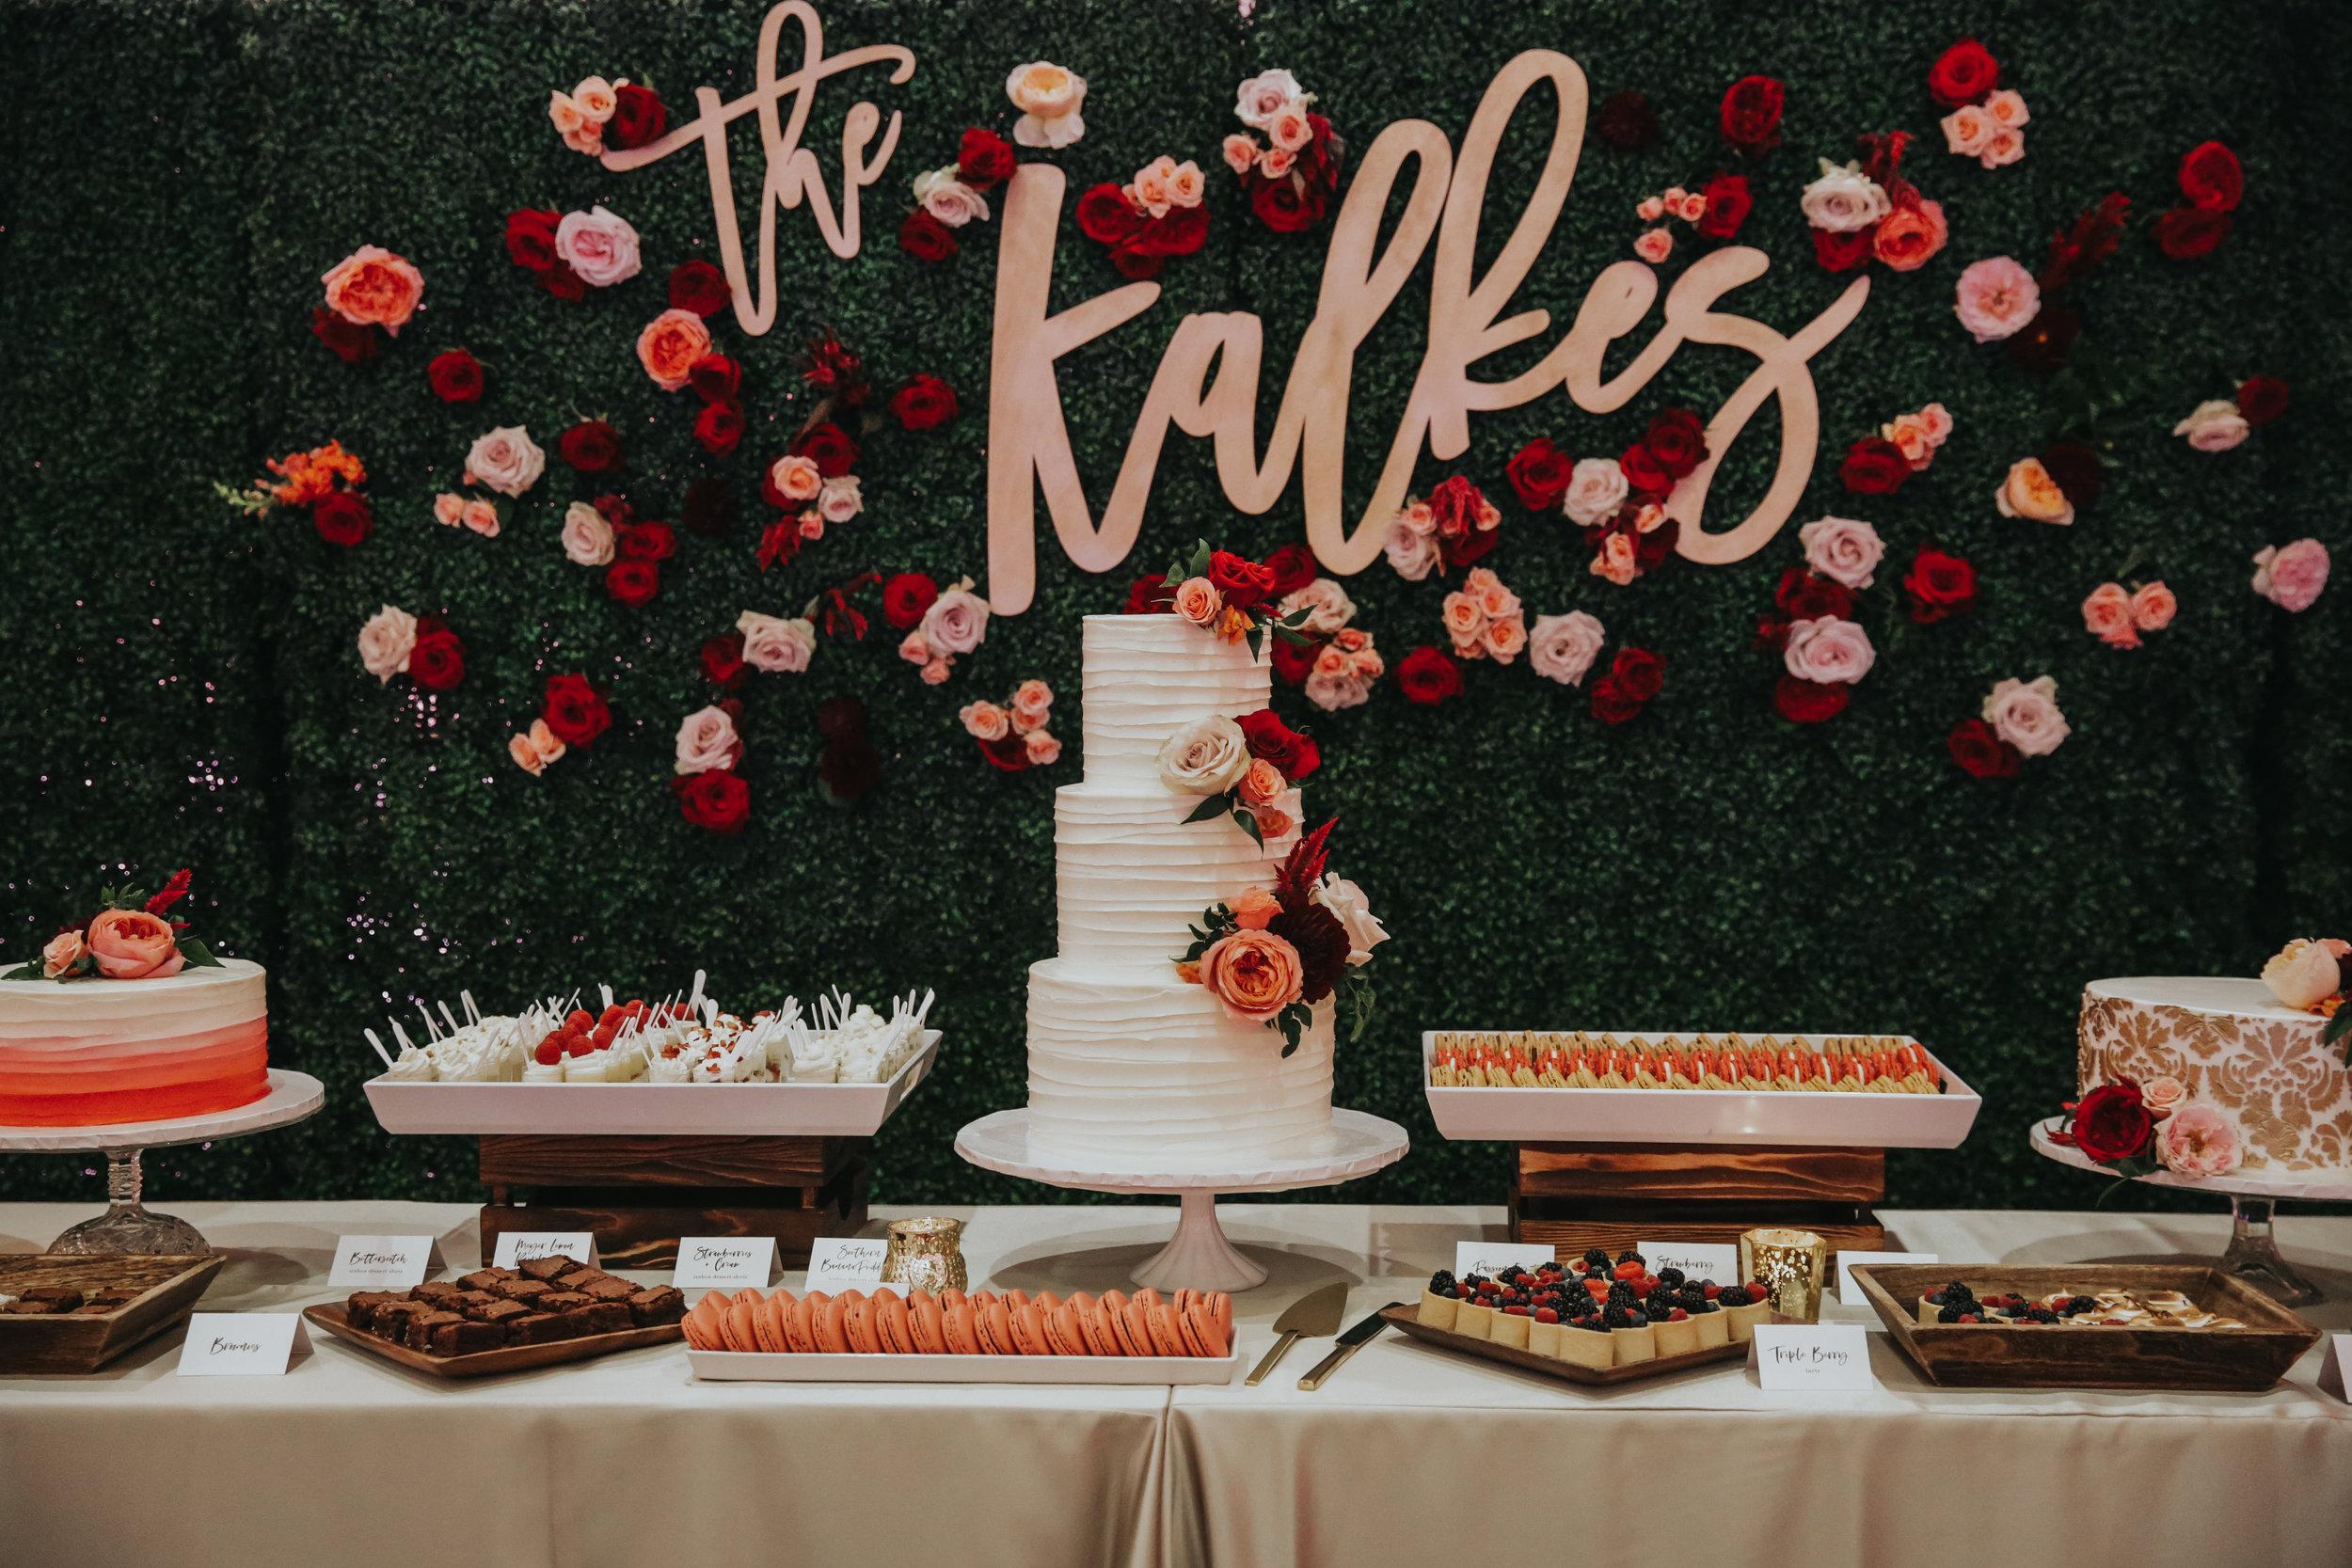 custom wedding cake, custom wedding desserts, wedding desserts, dessert bar, outdoor wedding, Los Angeles wedding, custom signage     Orange Blossom Special Events